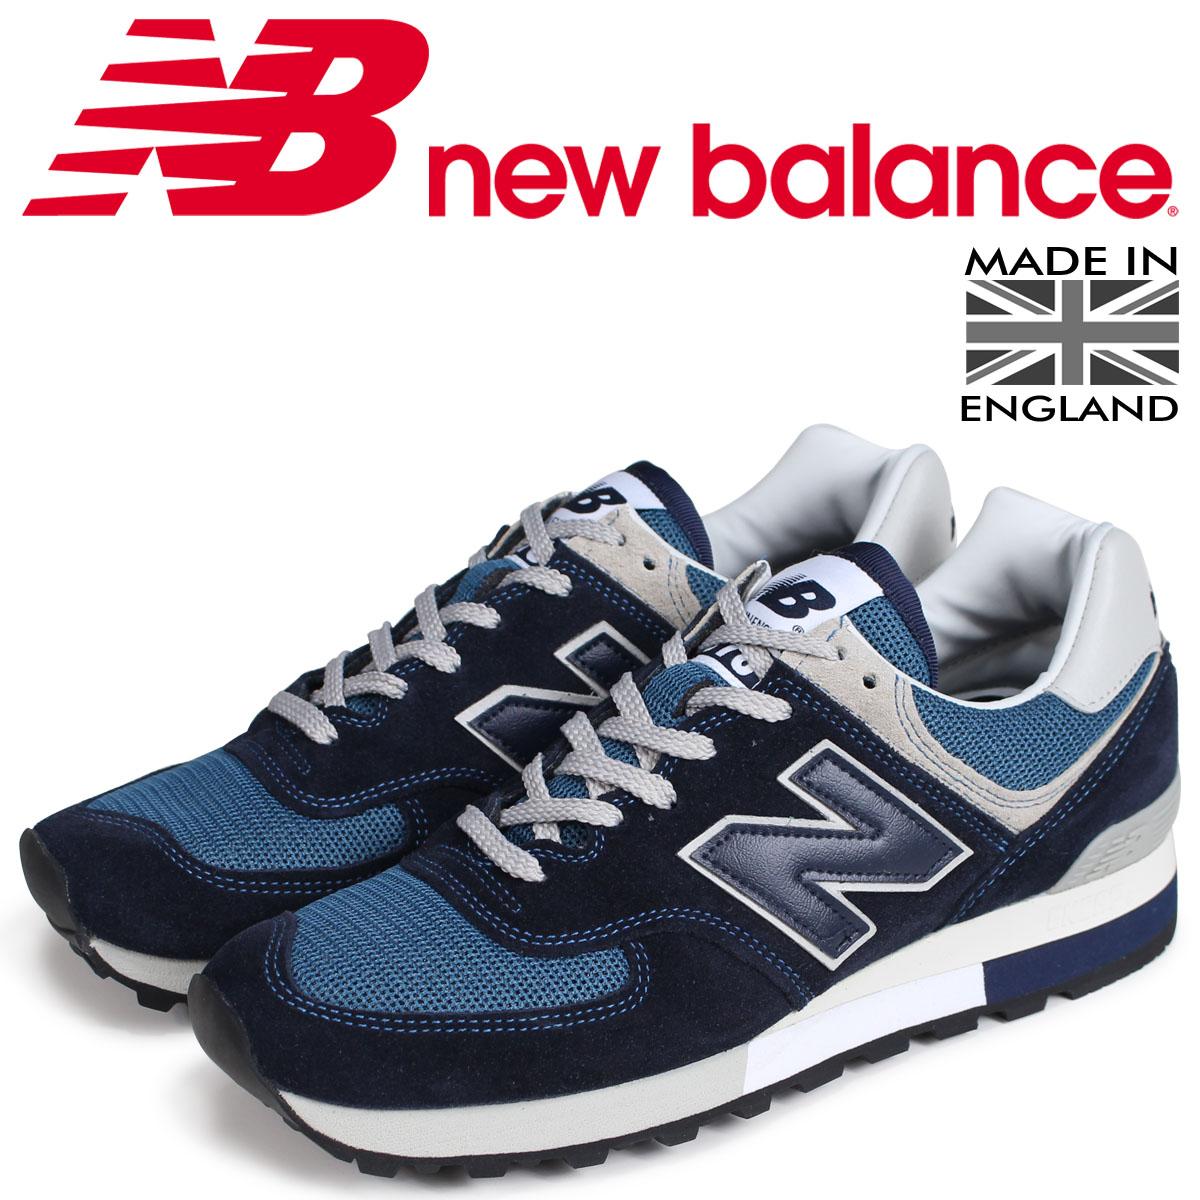 new balance 576 メンズ ニューバランス スニーカー OM576OGN Dワイズ MADE IN UK ネイビー